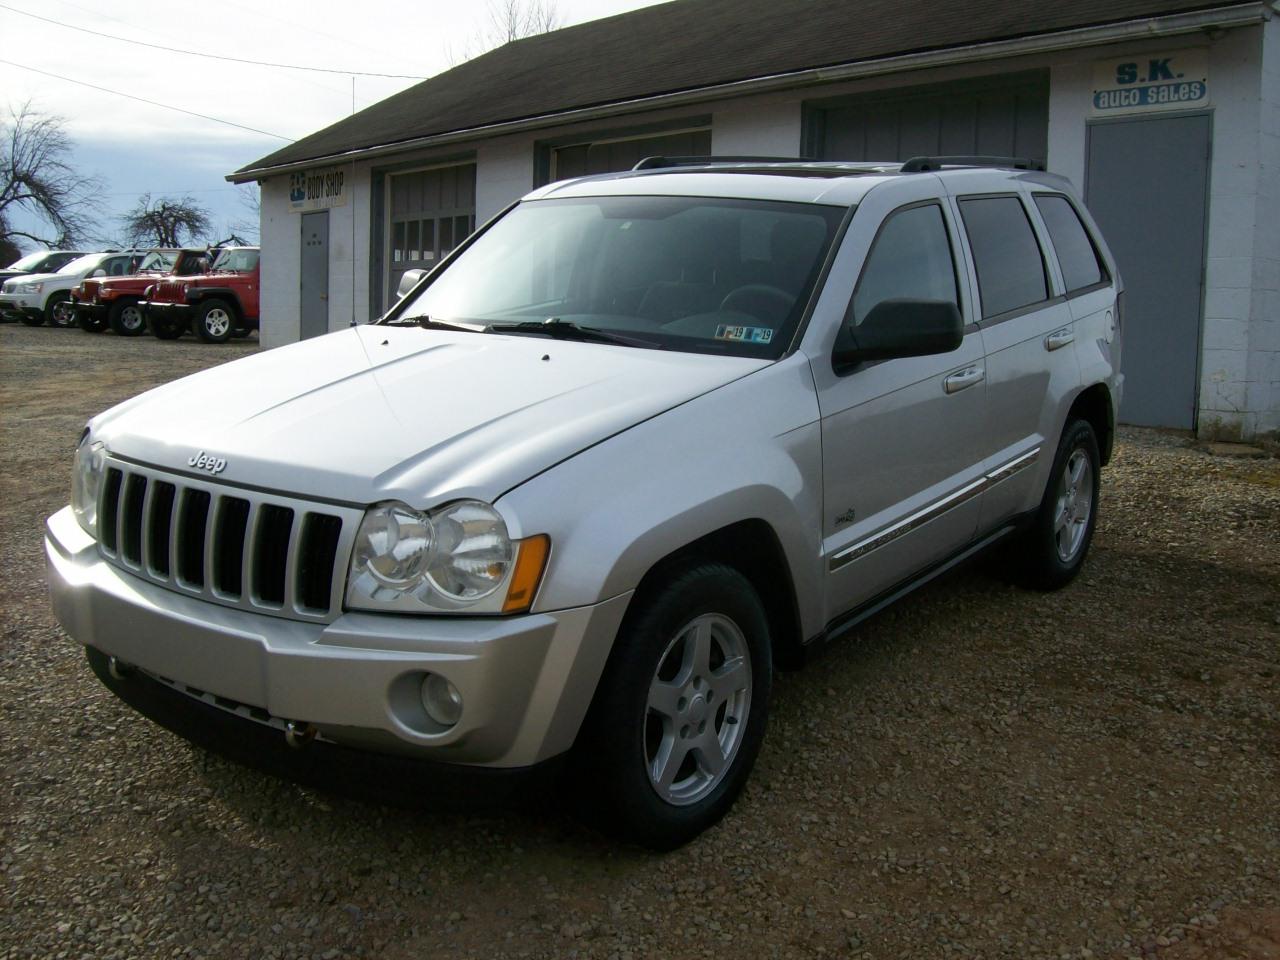 2006 Jeep Grand Cherokee Laredo 65th Anniversary Edition 4 4 102k Miles S K Auto Sales